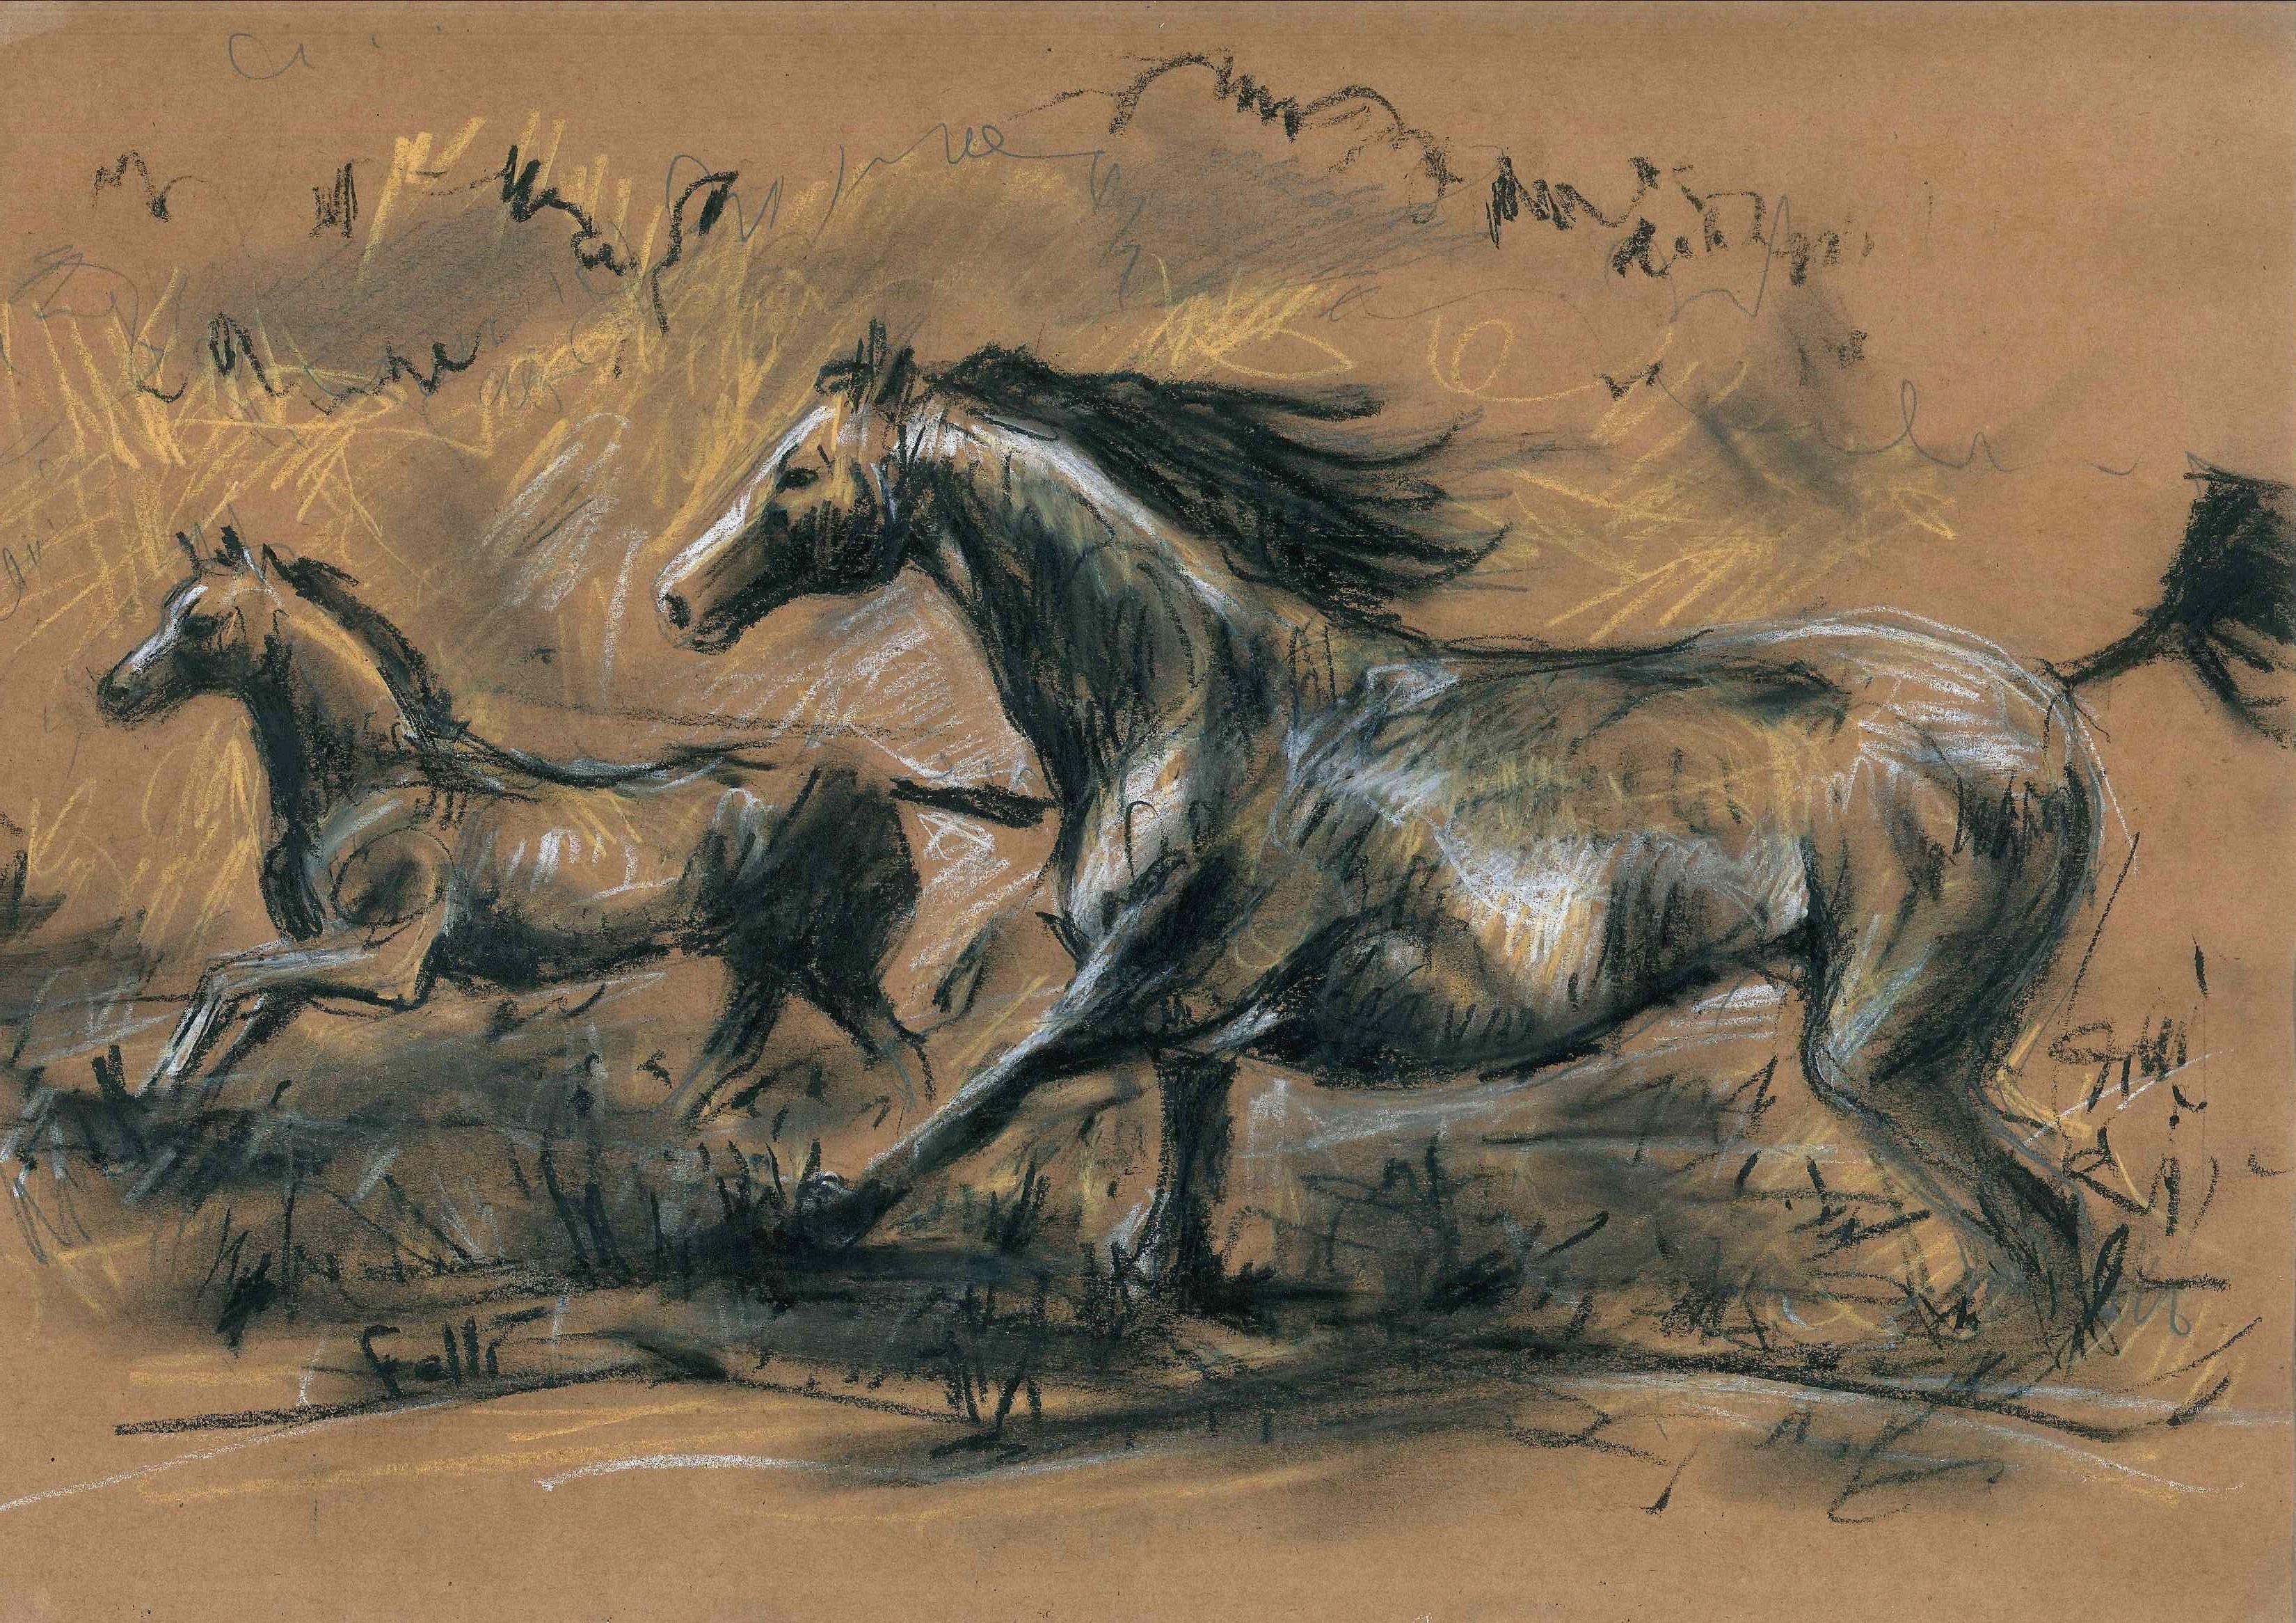 En familia -  Lápices sobre papel madera. 43 x 30 cm - Alejandro Felli